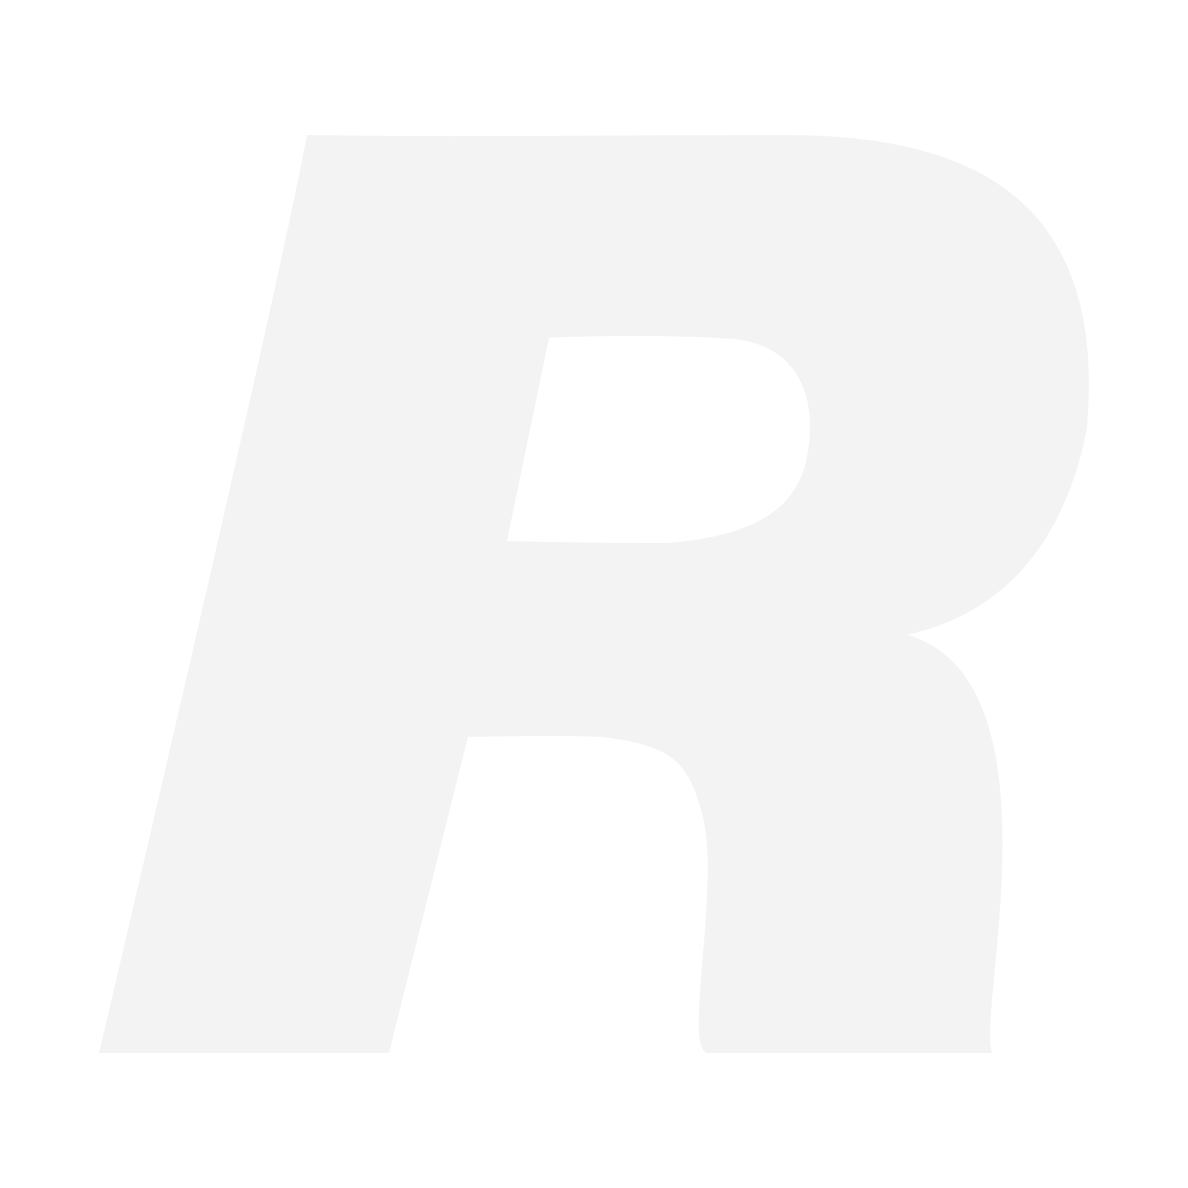 Tamron AF 18-270/3.5-6.3 Di II PZD -objektiv, Sony A